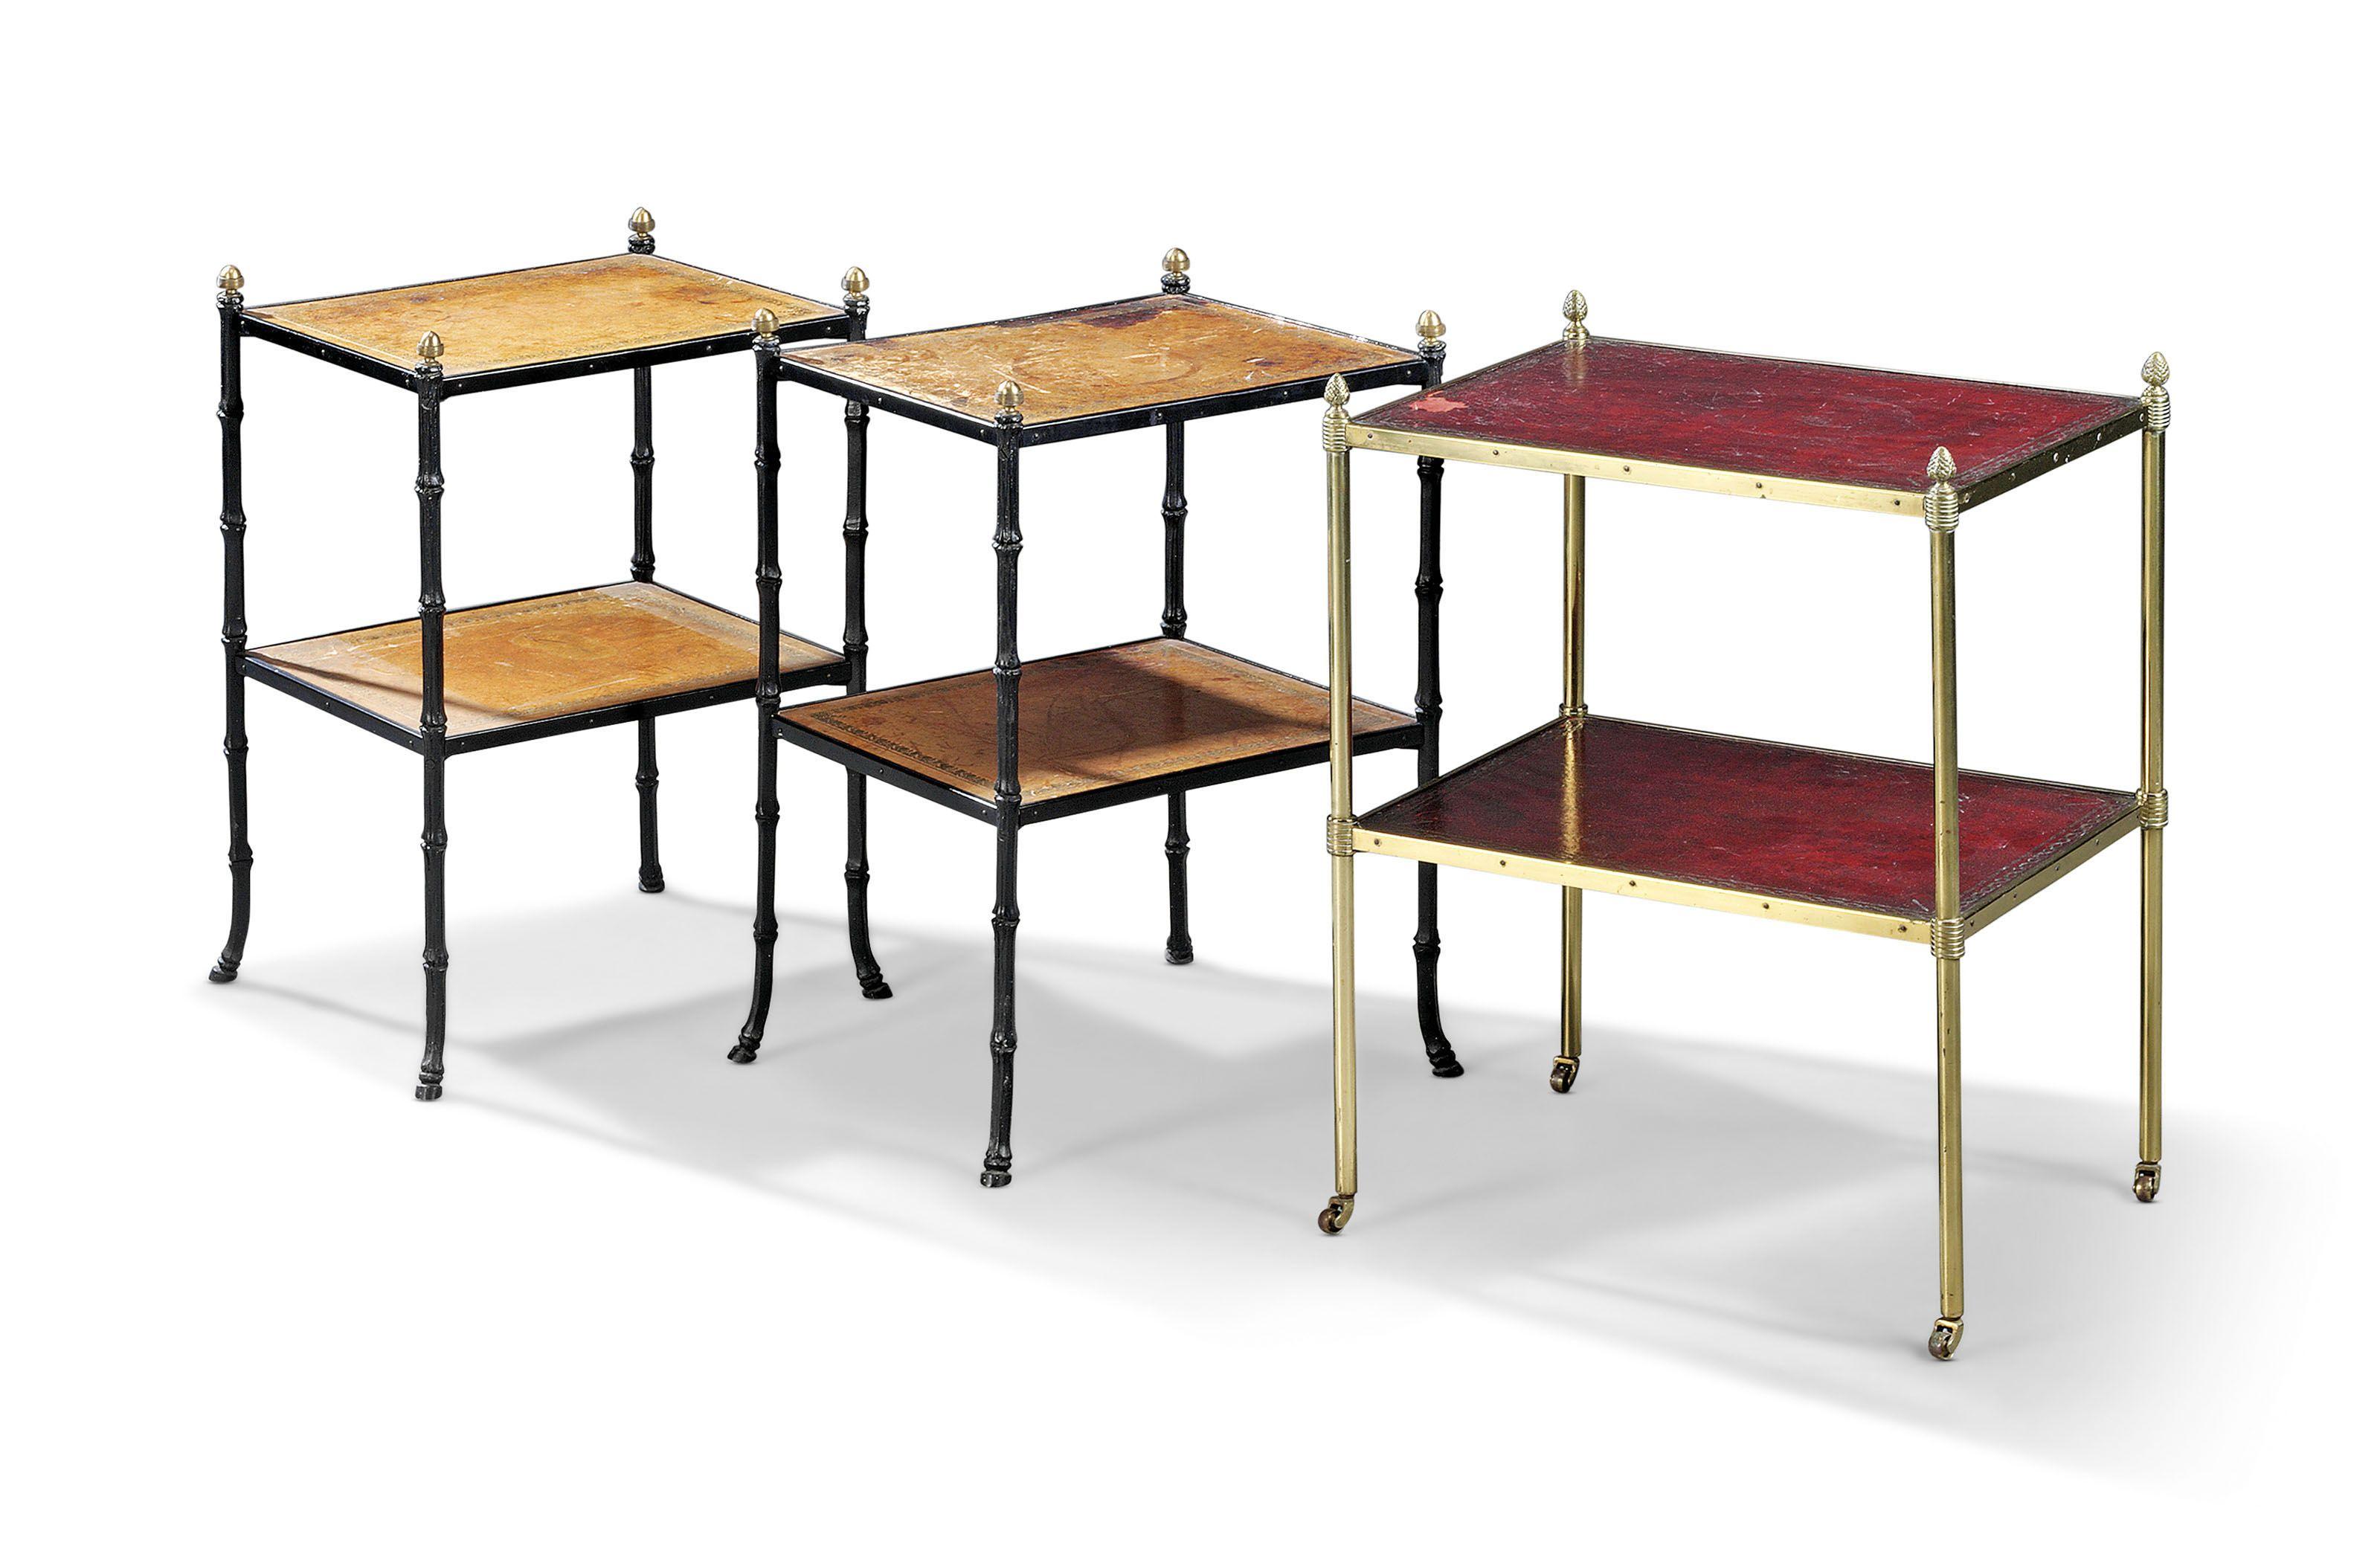 THREE TWO-TIER ETAGERES | THIRD QUARTER 20TH CENTURY | etagere, Furniture & Lighting | Christie's